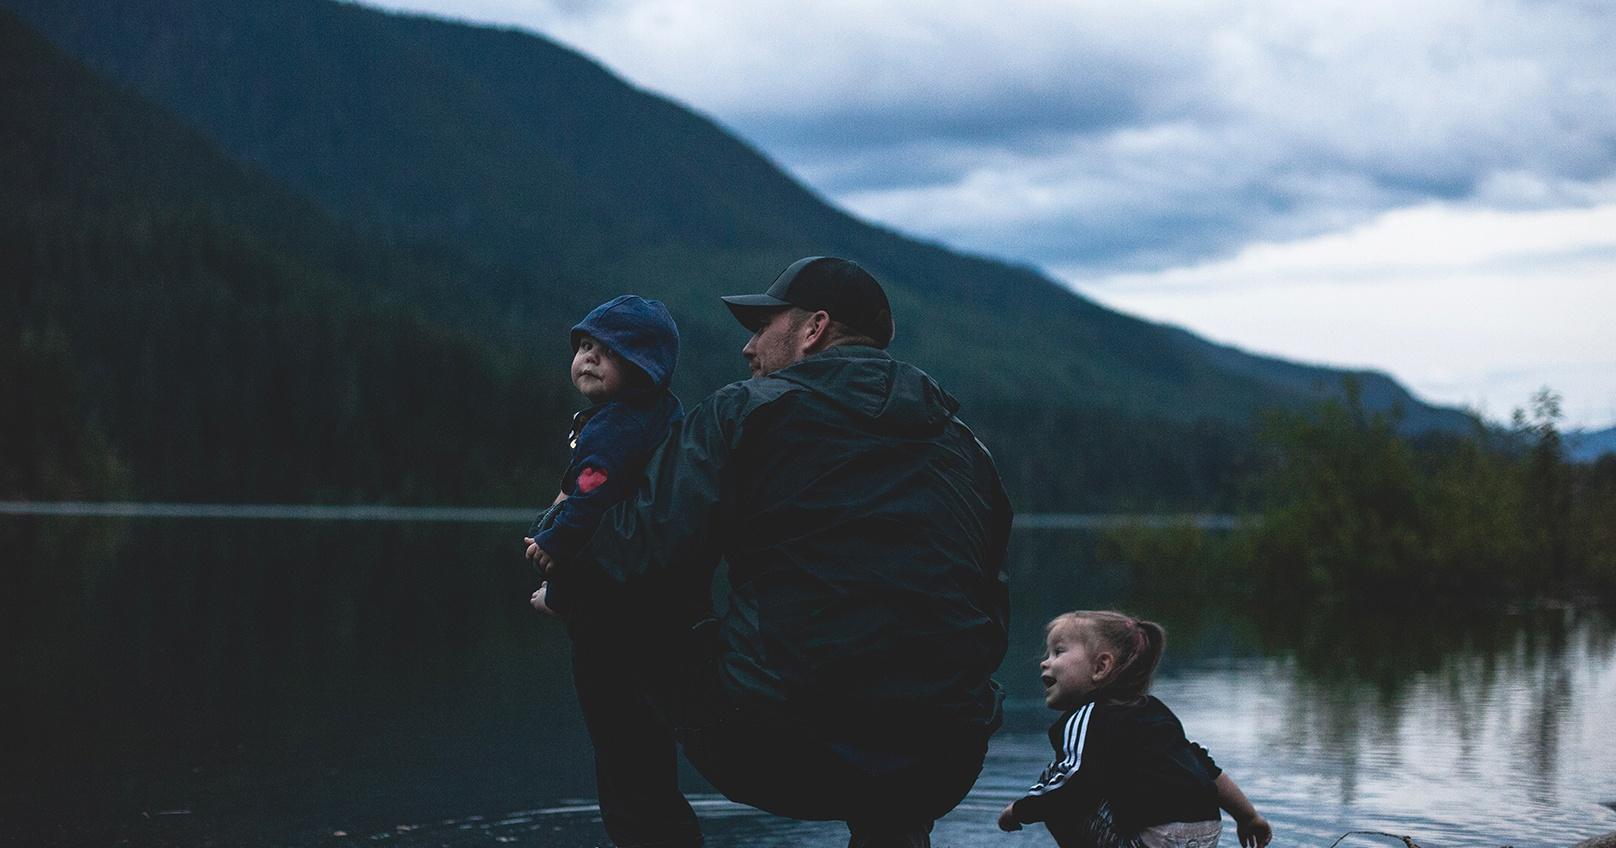 blog image - father